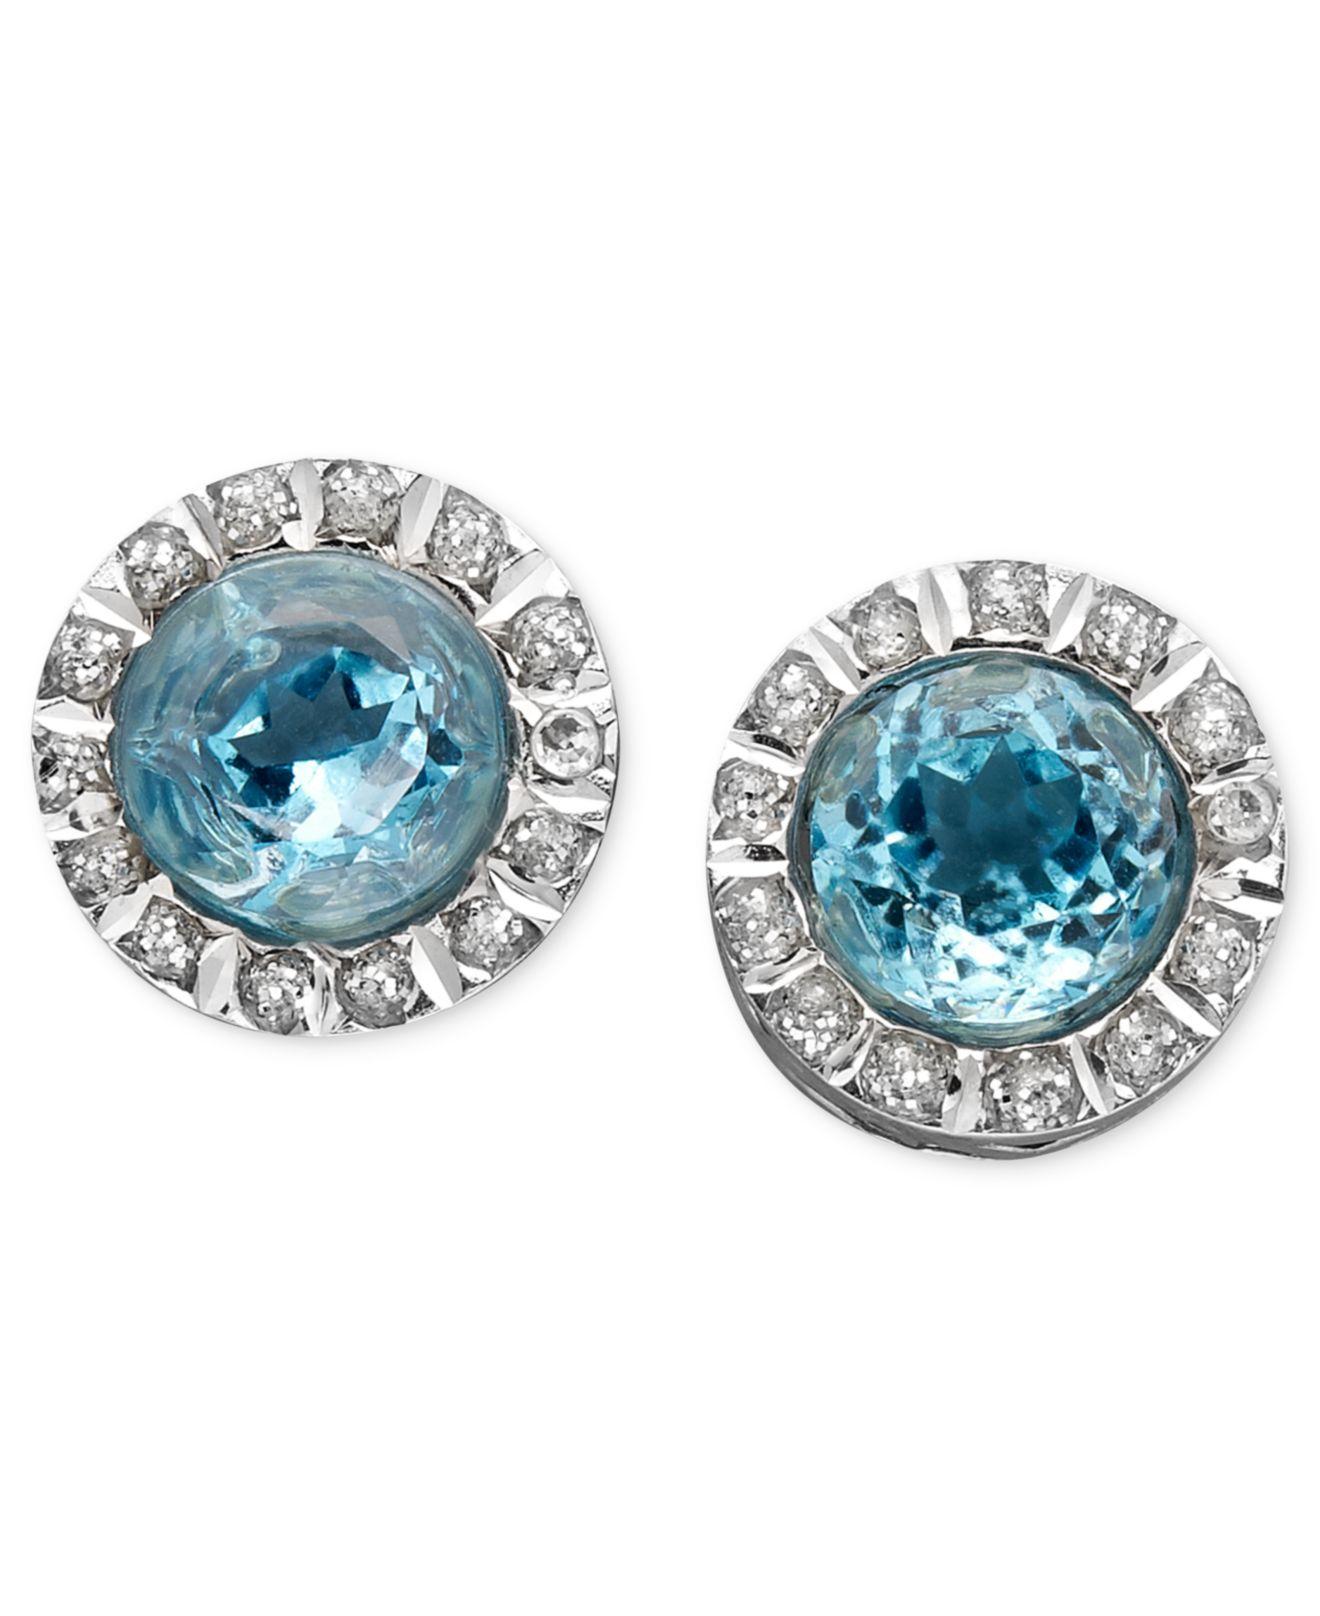 Macy s 14K White Gold Earrings Blue Topaz 6 Ct T W And